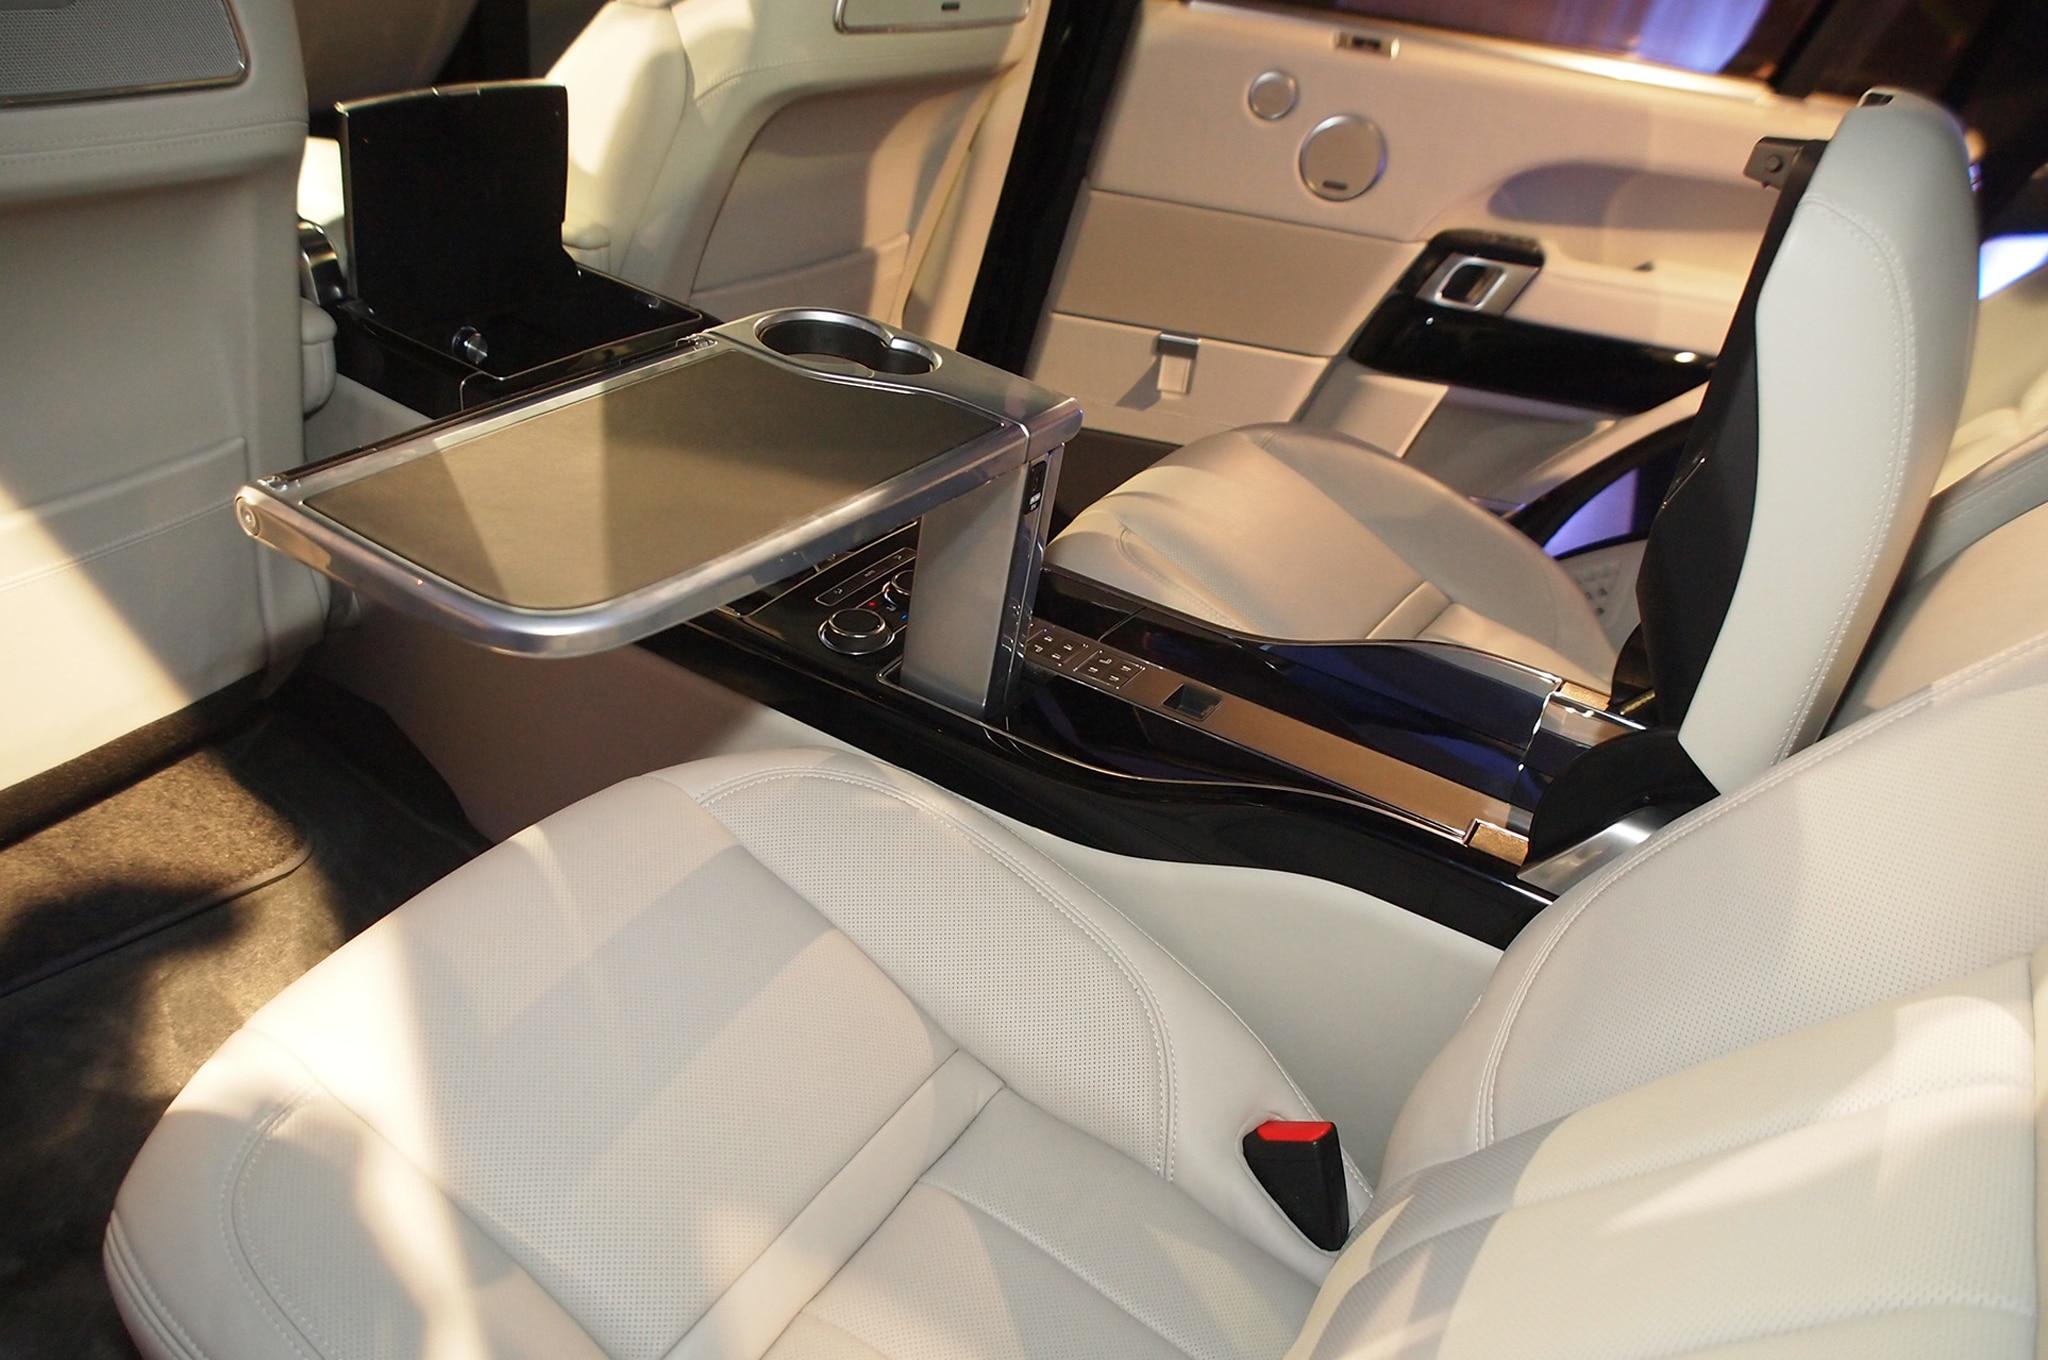 2016 Land Rover Range Rover SVAutobiography Cracks the $200,000 Mark